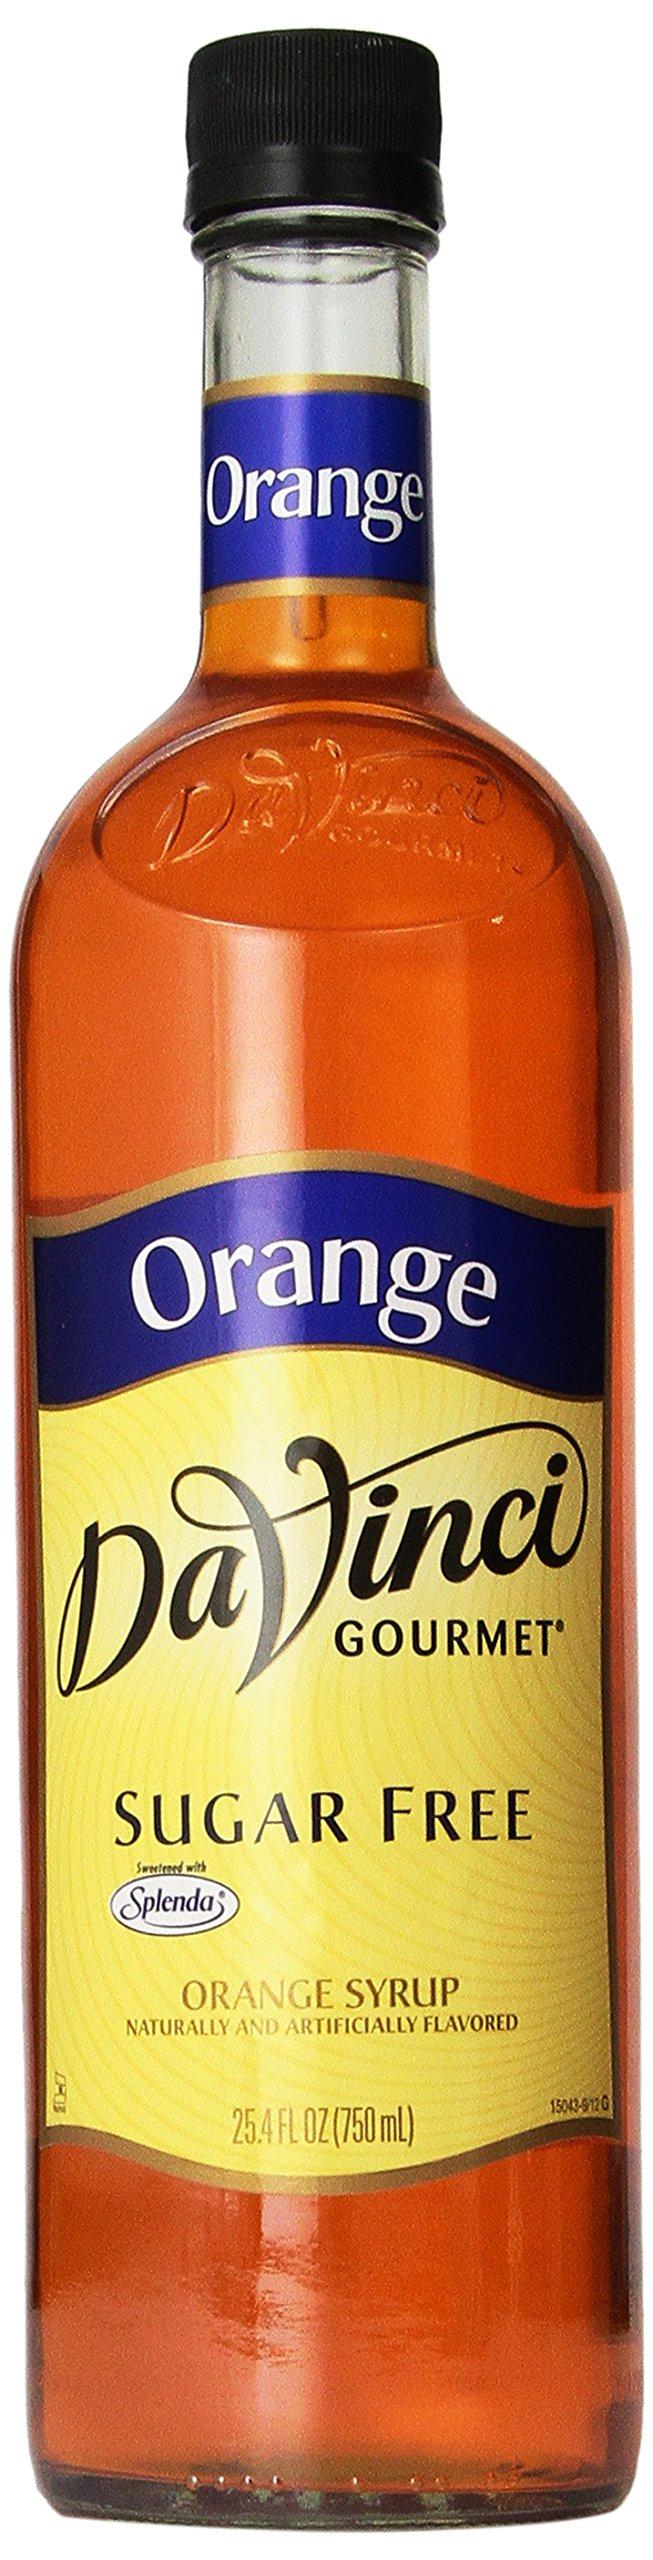 Da Vinci SUGAR FREE Orange Syrup 750mL with Splenda